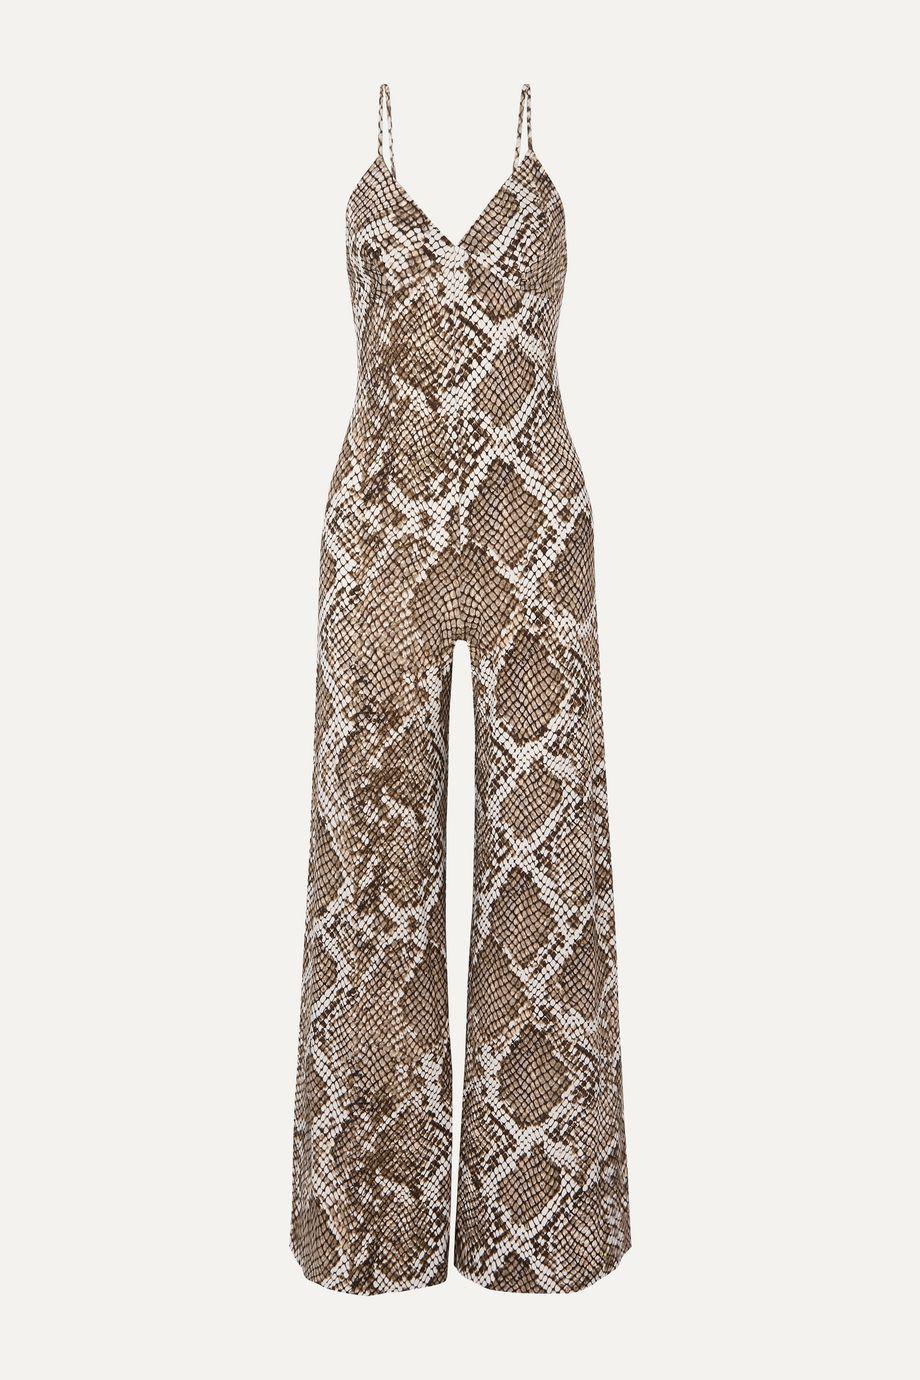 Norma Kamali Combi-pantalon en jersey stretch imprimé serpent